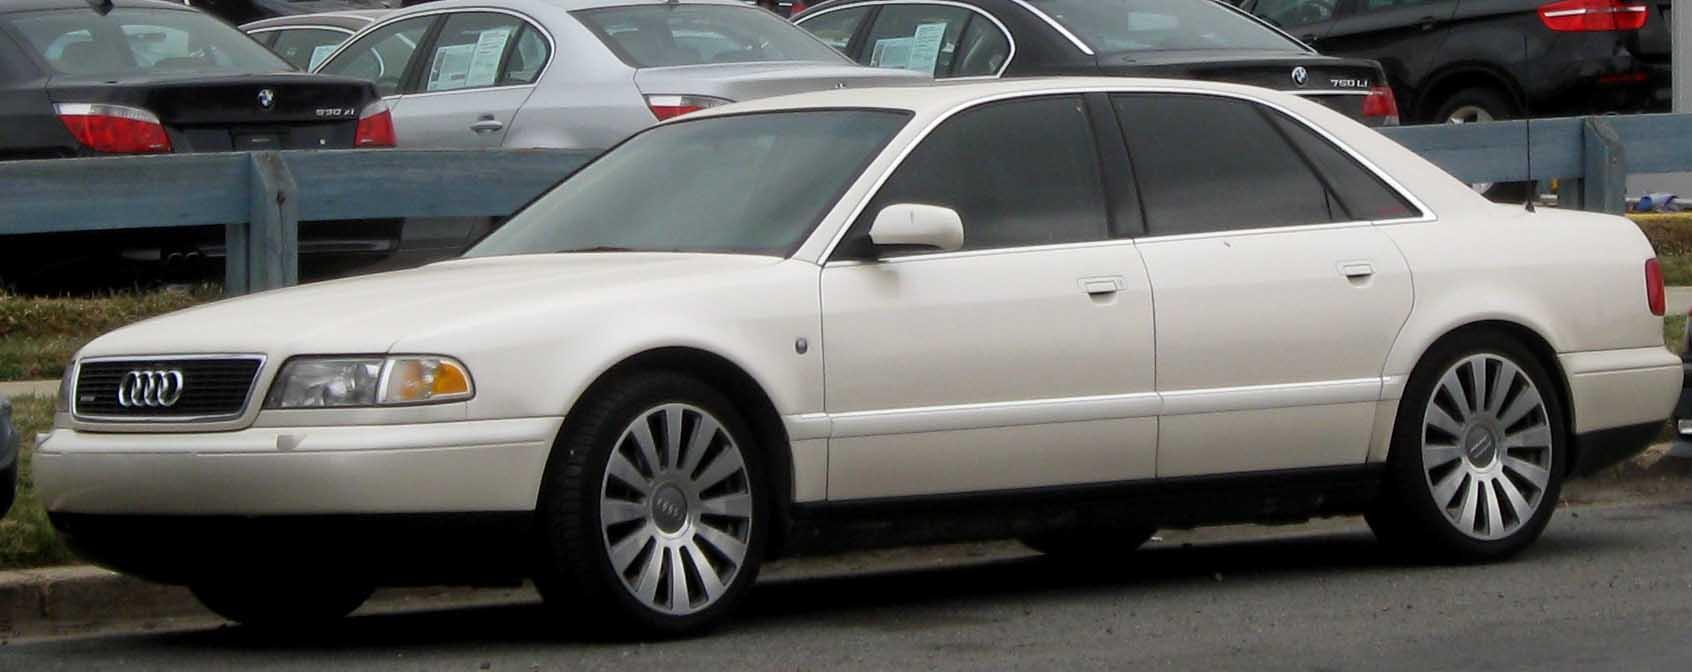 File 1st Audi A8 4 2 Jpg